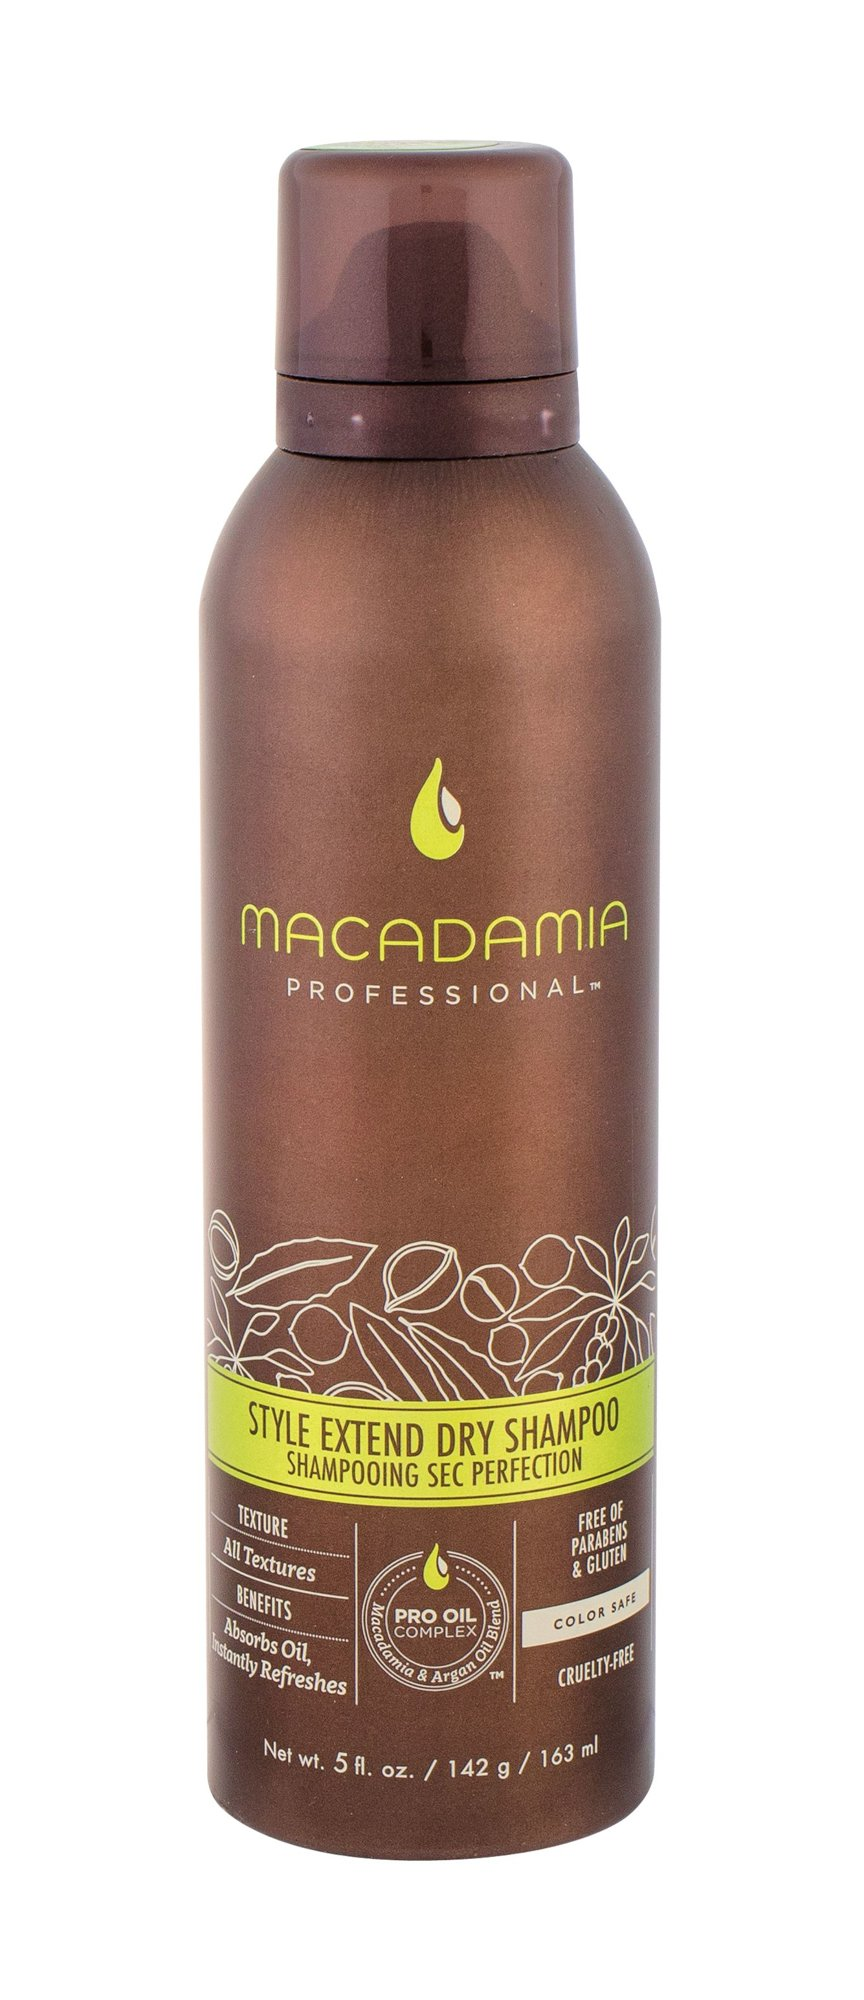 Macadamia Professional Style Extend Dry Shampoo 163ml